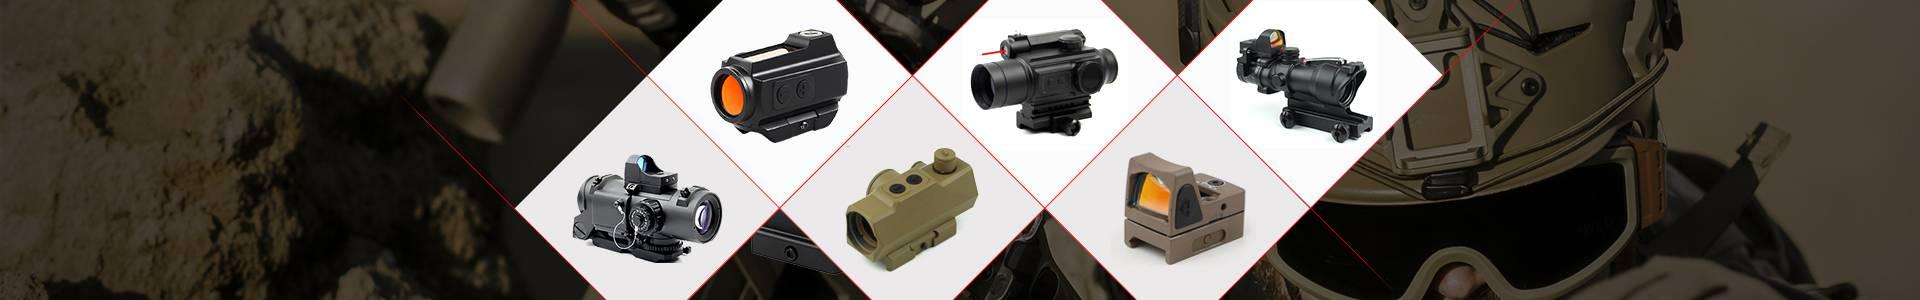 Long Xiang Optics-Tactical Scopes | Find M4 Optics On Long Xiang Optics